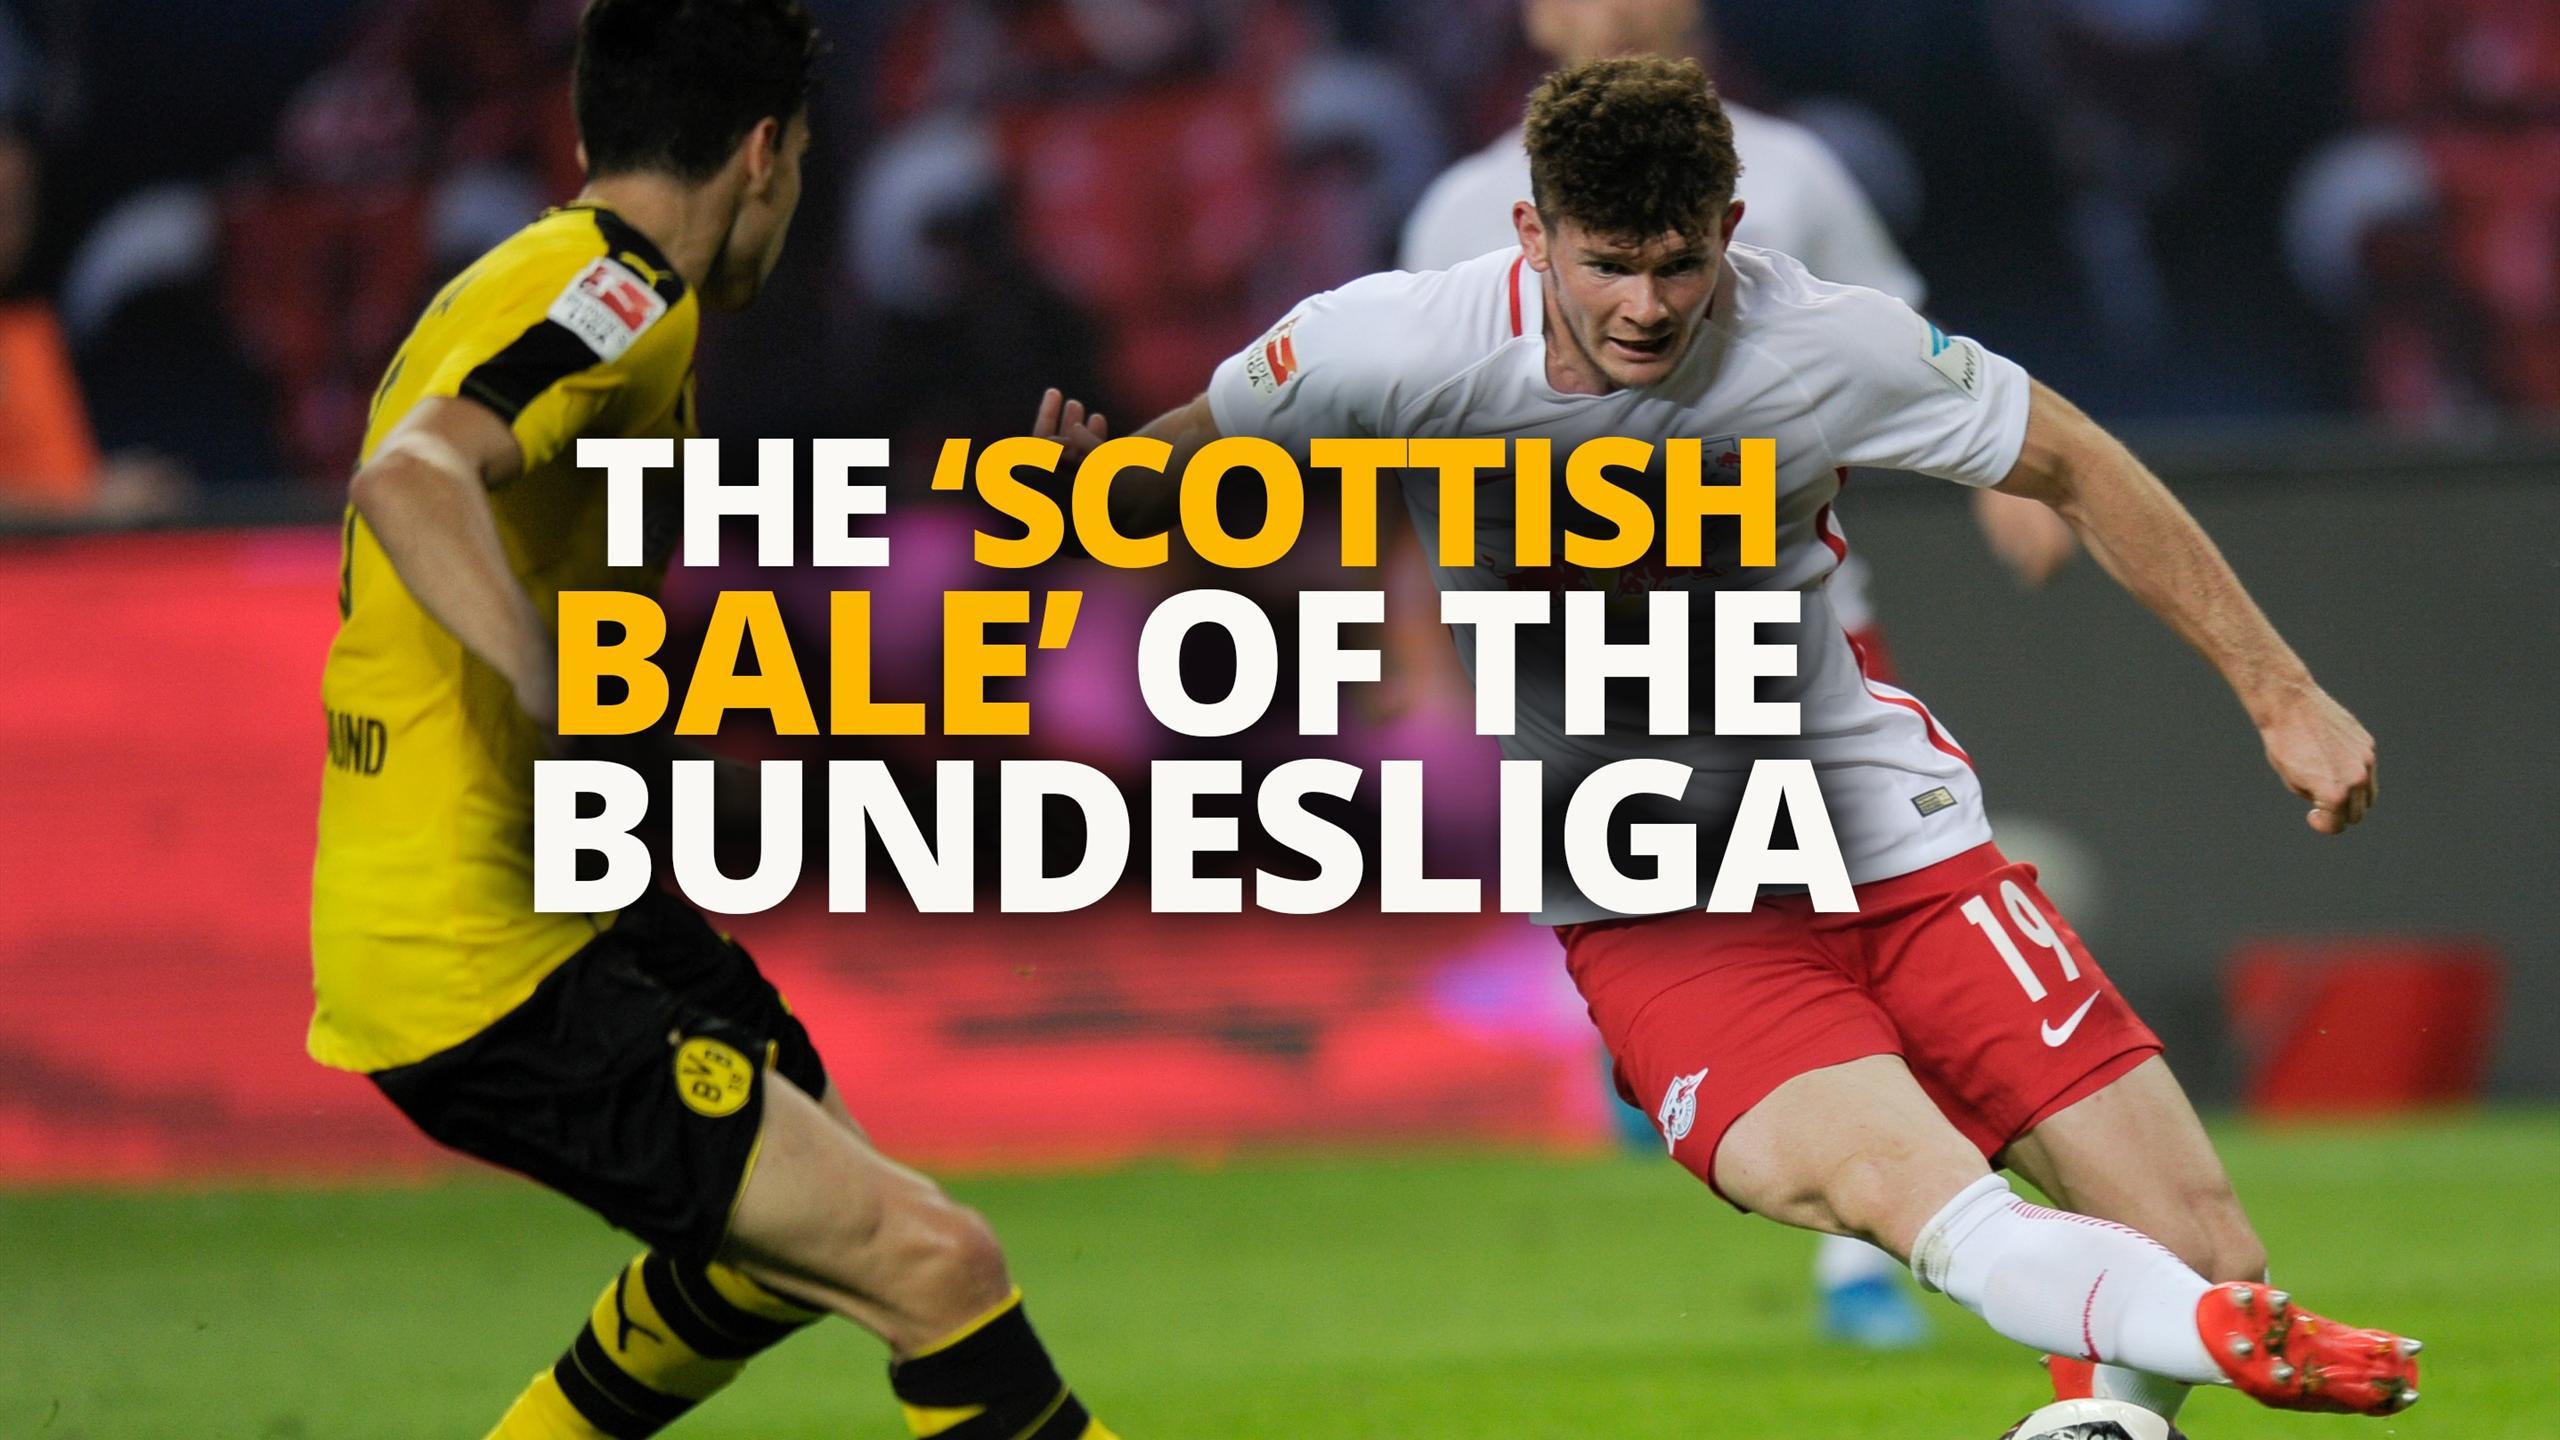 The 'Scottish Bale' taking the Bundesliga by storm